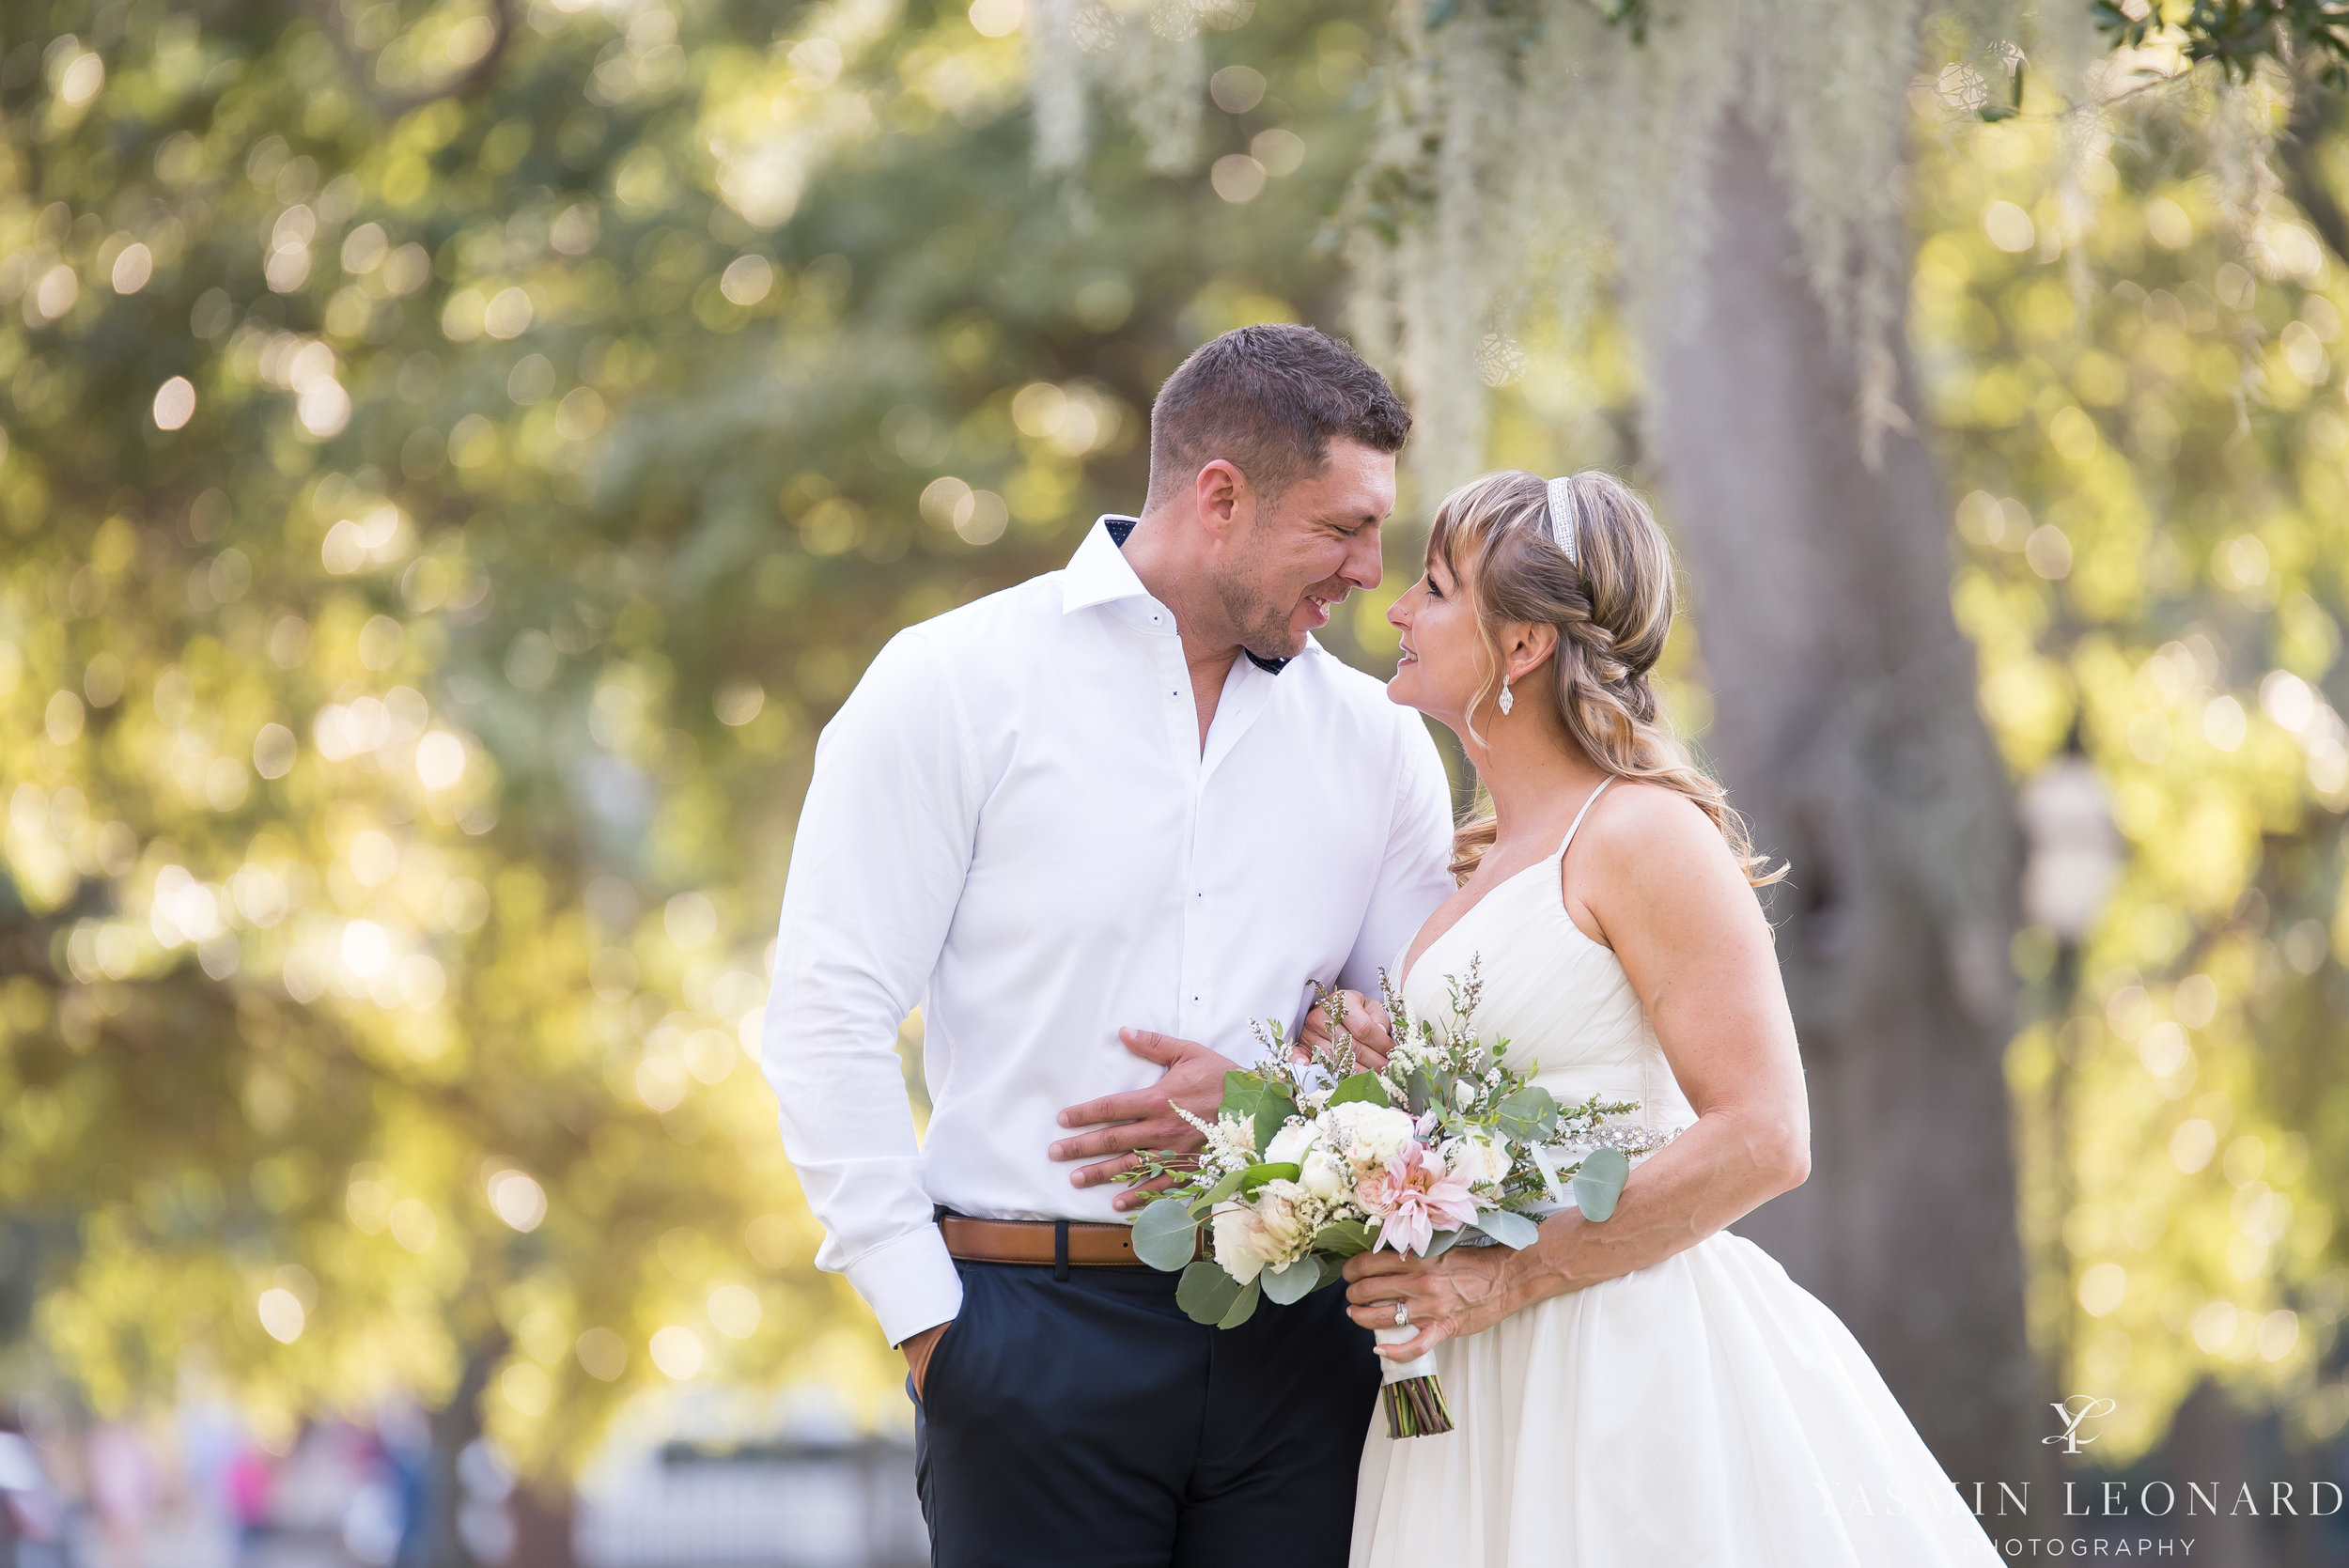 Downtown Charleston Wedding - NC Wedding Photographer -10.jpg